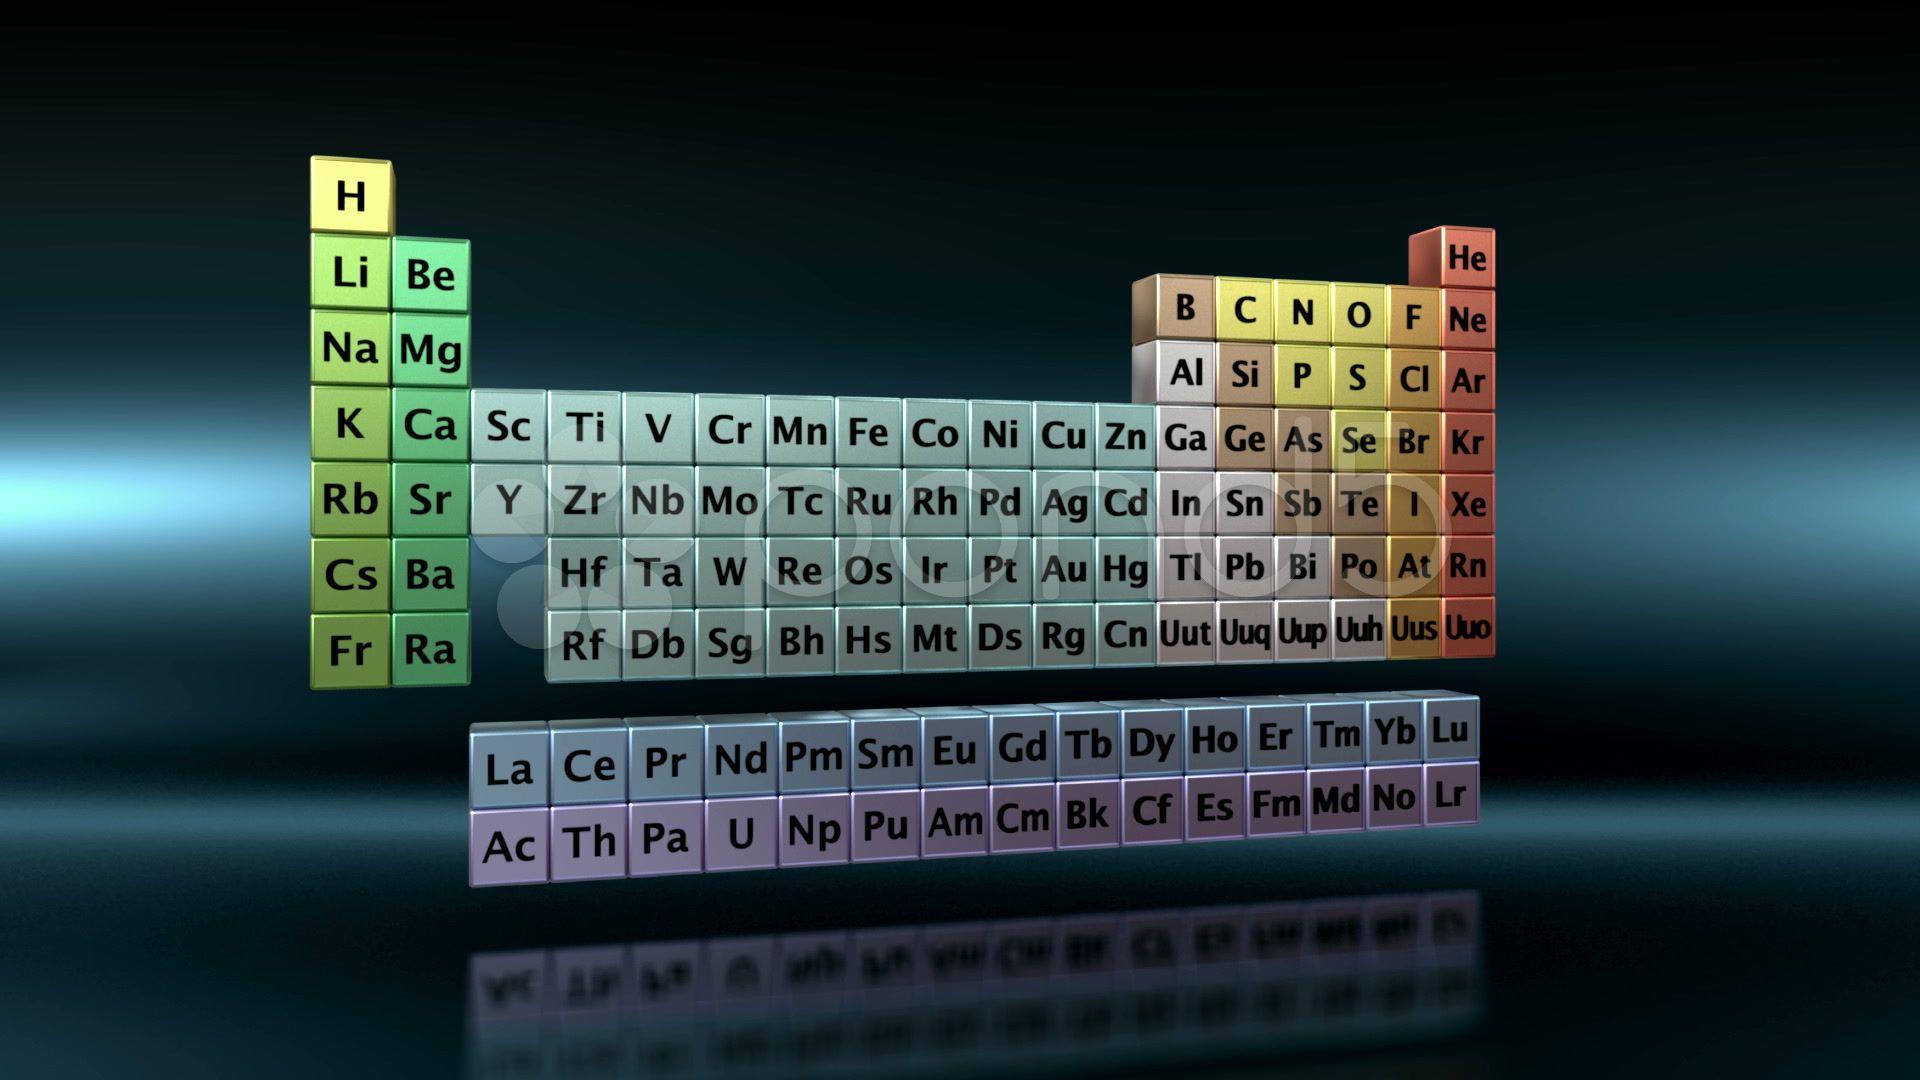 Gambar Hd Tabel Periodik - Gambar Terbaru HD